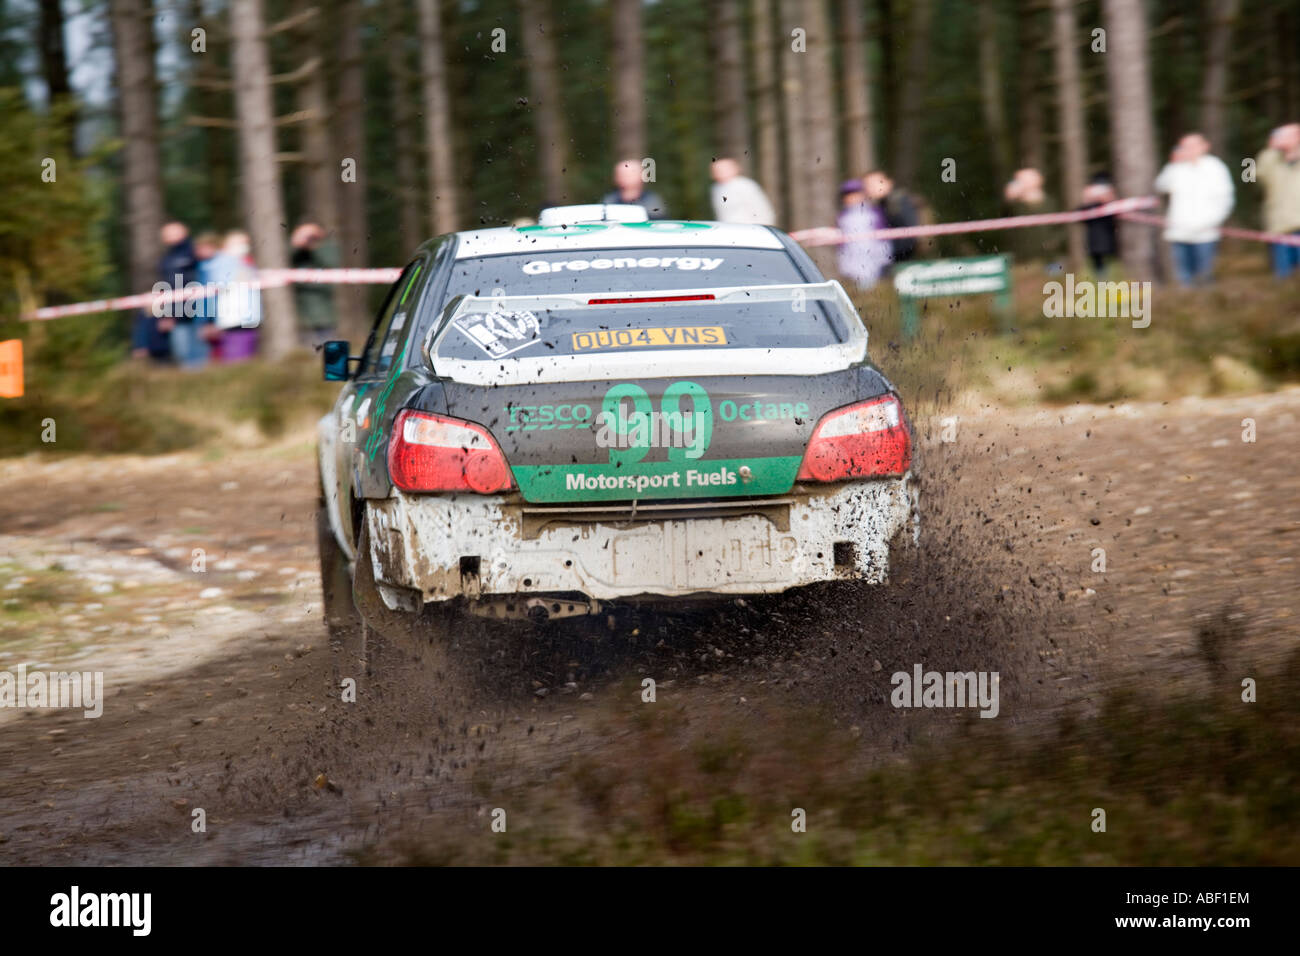 Green And White Subaru Impreza Rally Car 99 Driving Action Spraying Gravel Stones Dirt Mud As It Turns A Corner